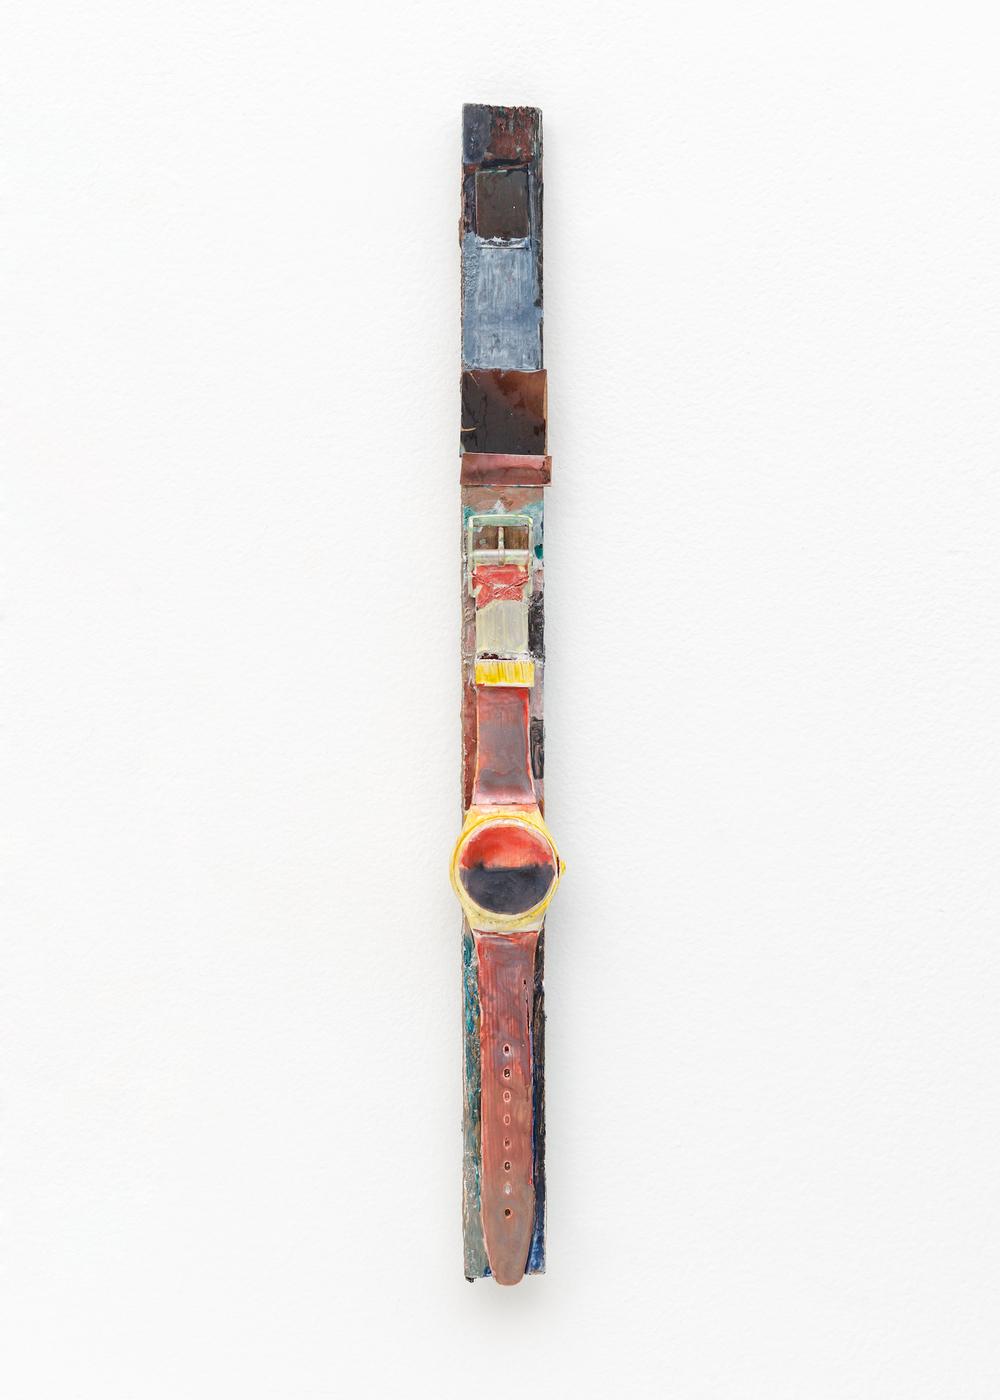 Hayley Tompkins  Shadow Clock III  2009 Wood, watercolor, watch 14h x 1 ¼w x ⅝d in HT005